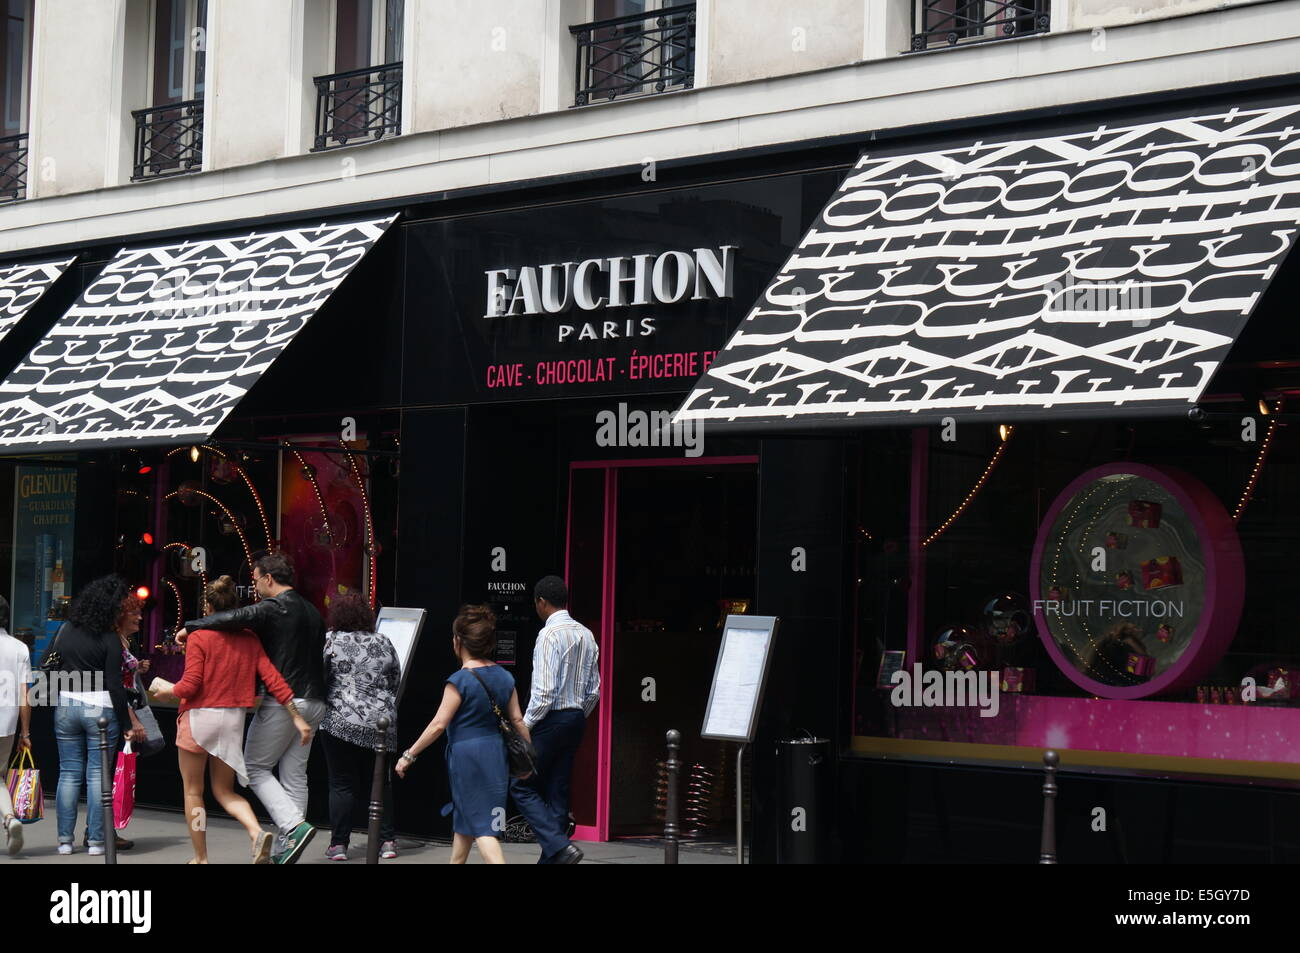 Diseño exterior de Fauchon Paris Imagen De Stock